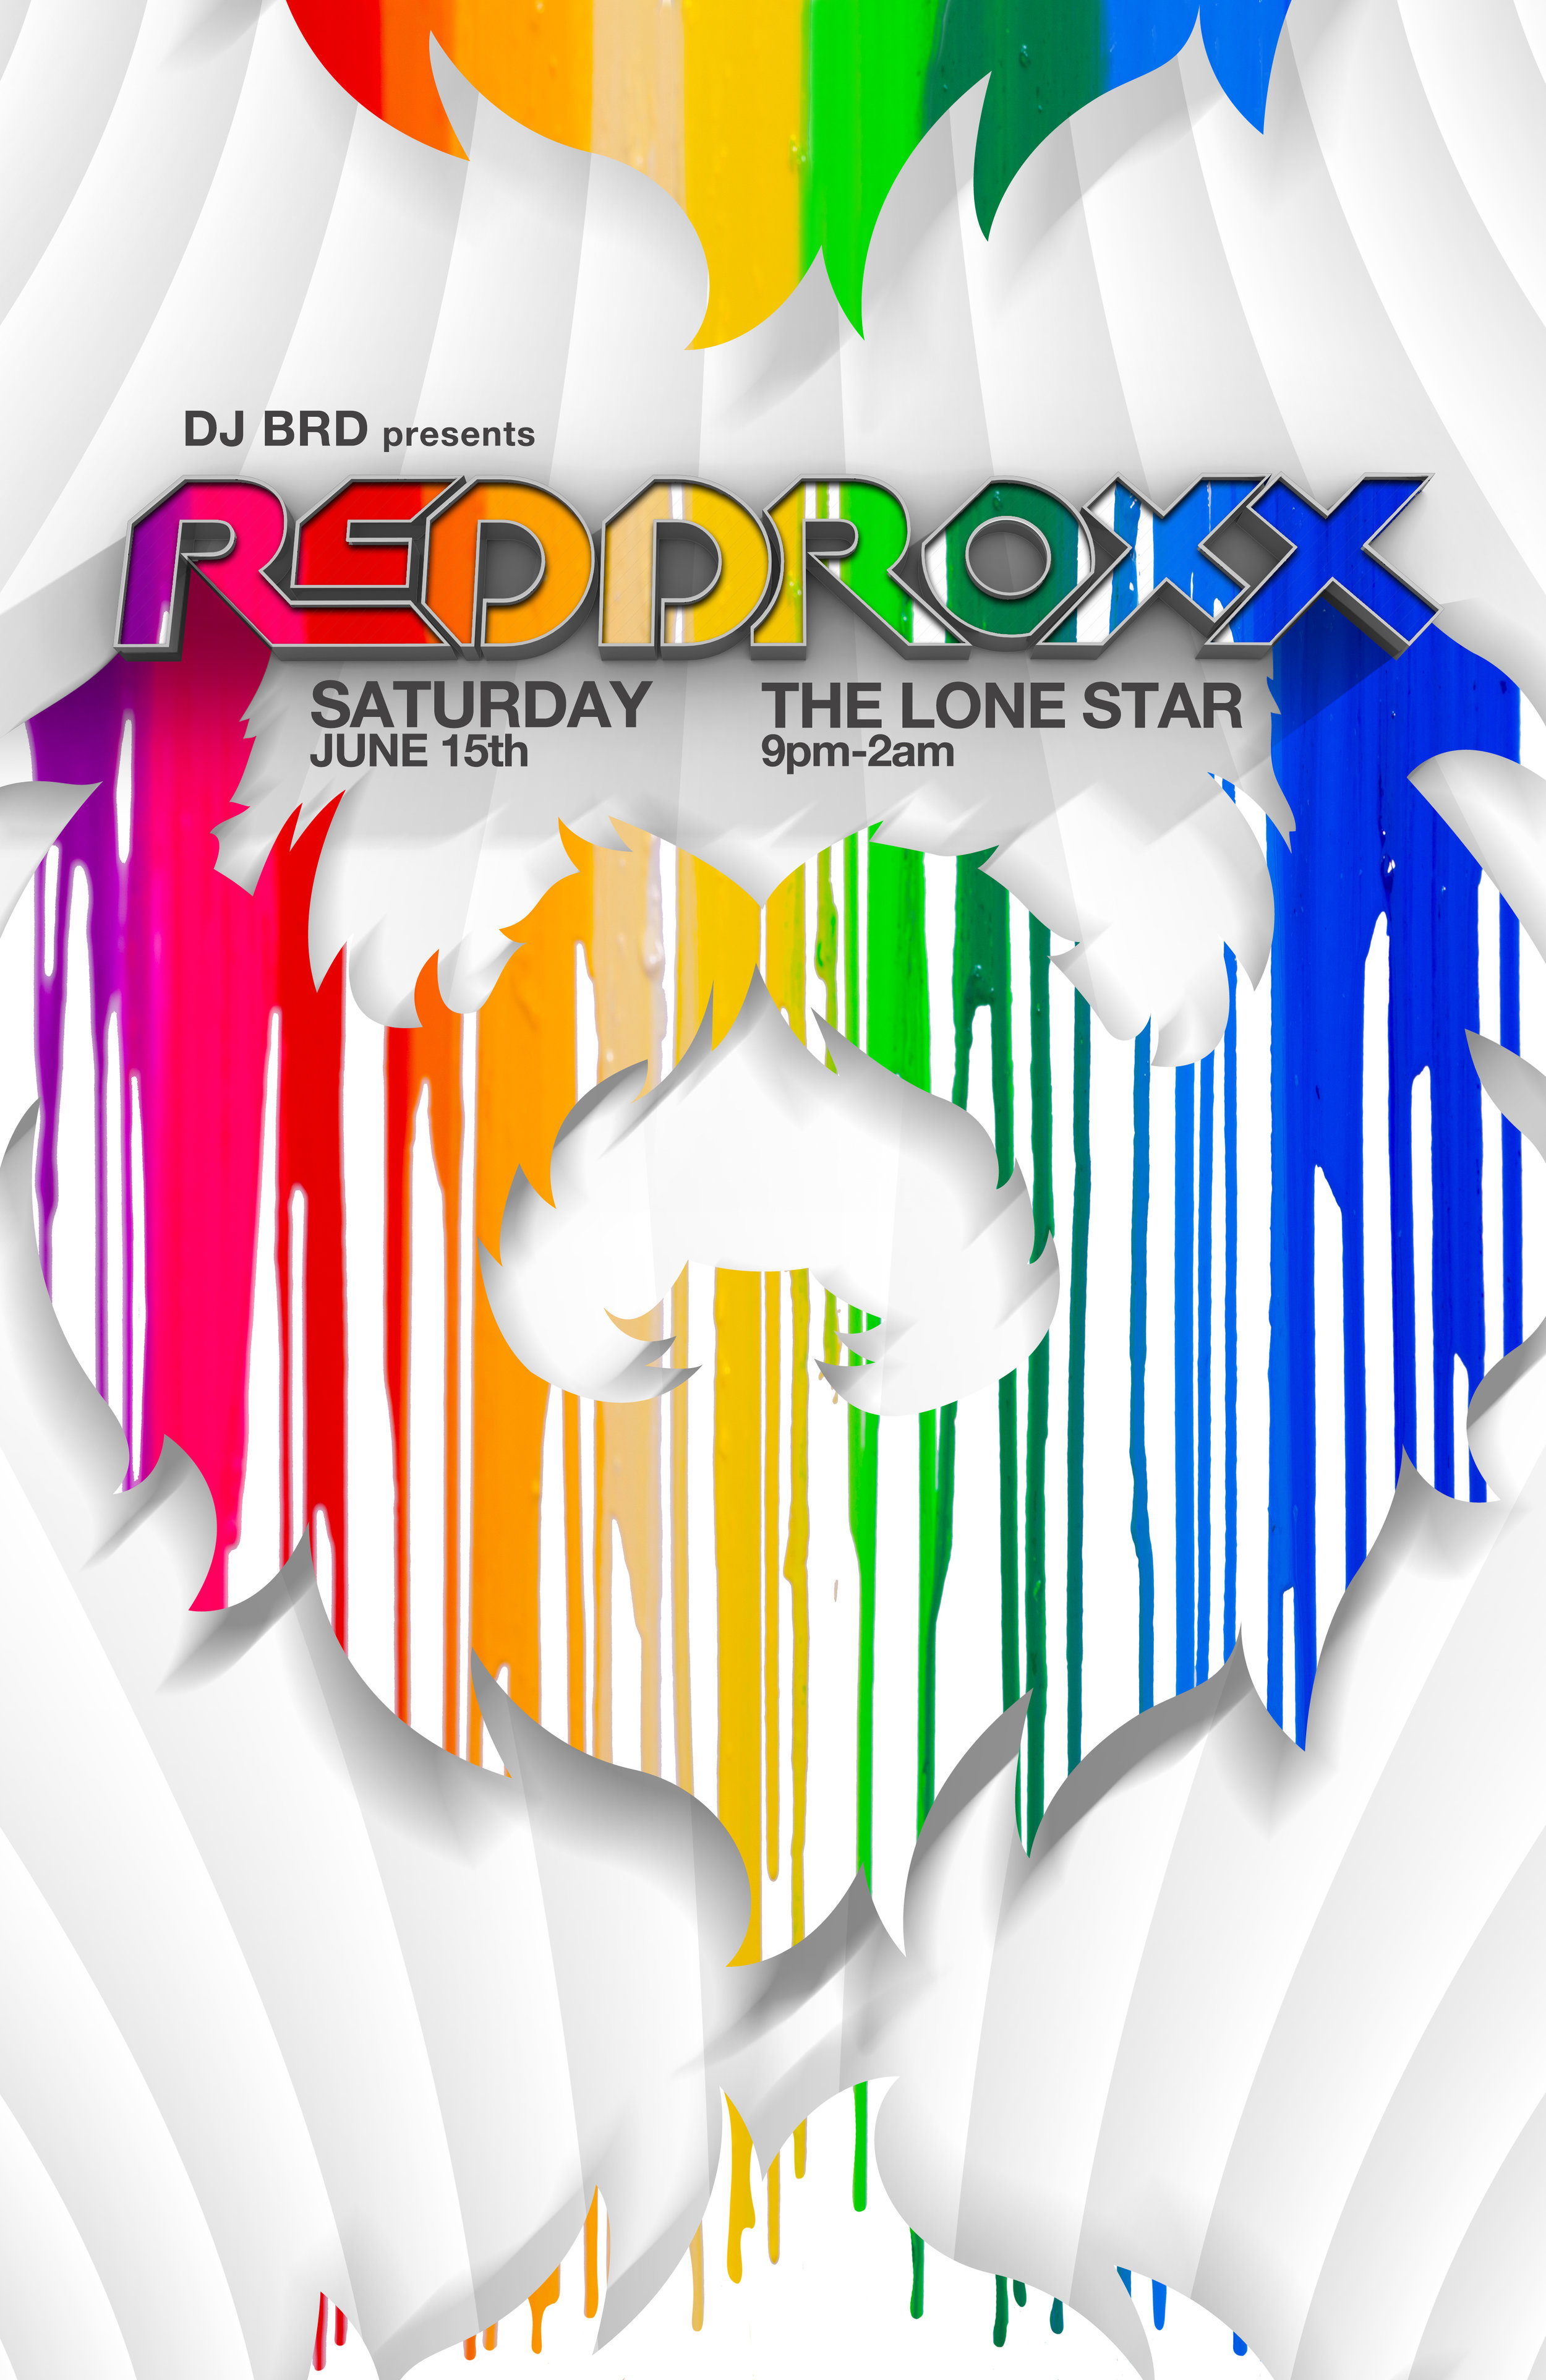 reddroxx_flyer86_11x17.jpg